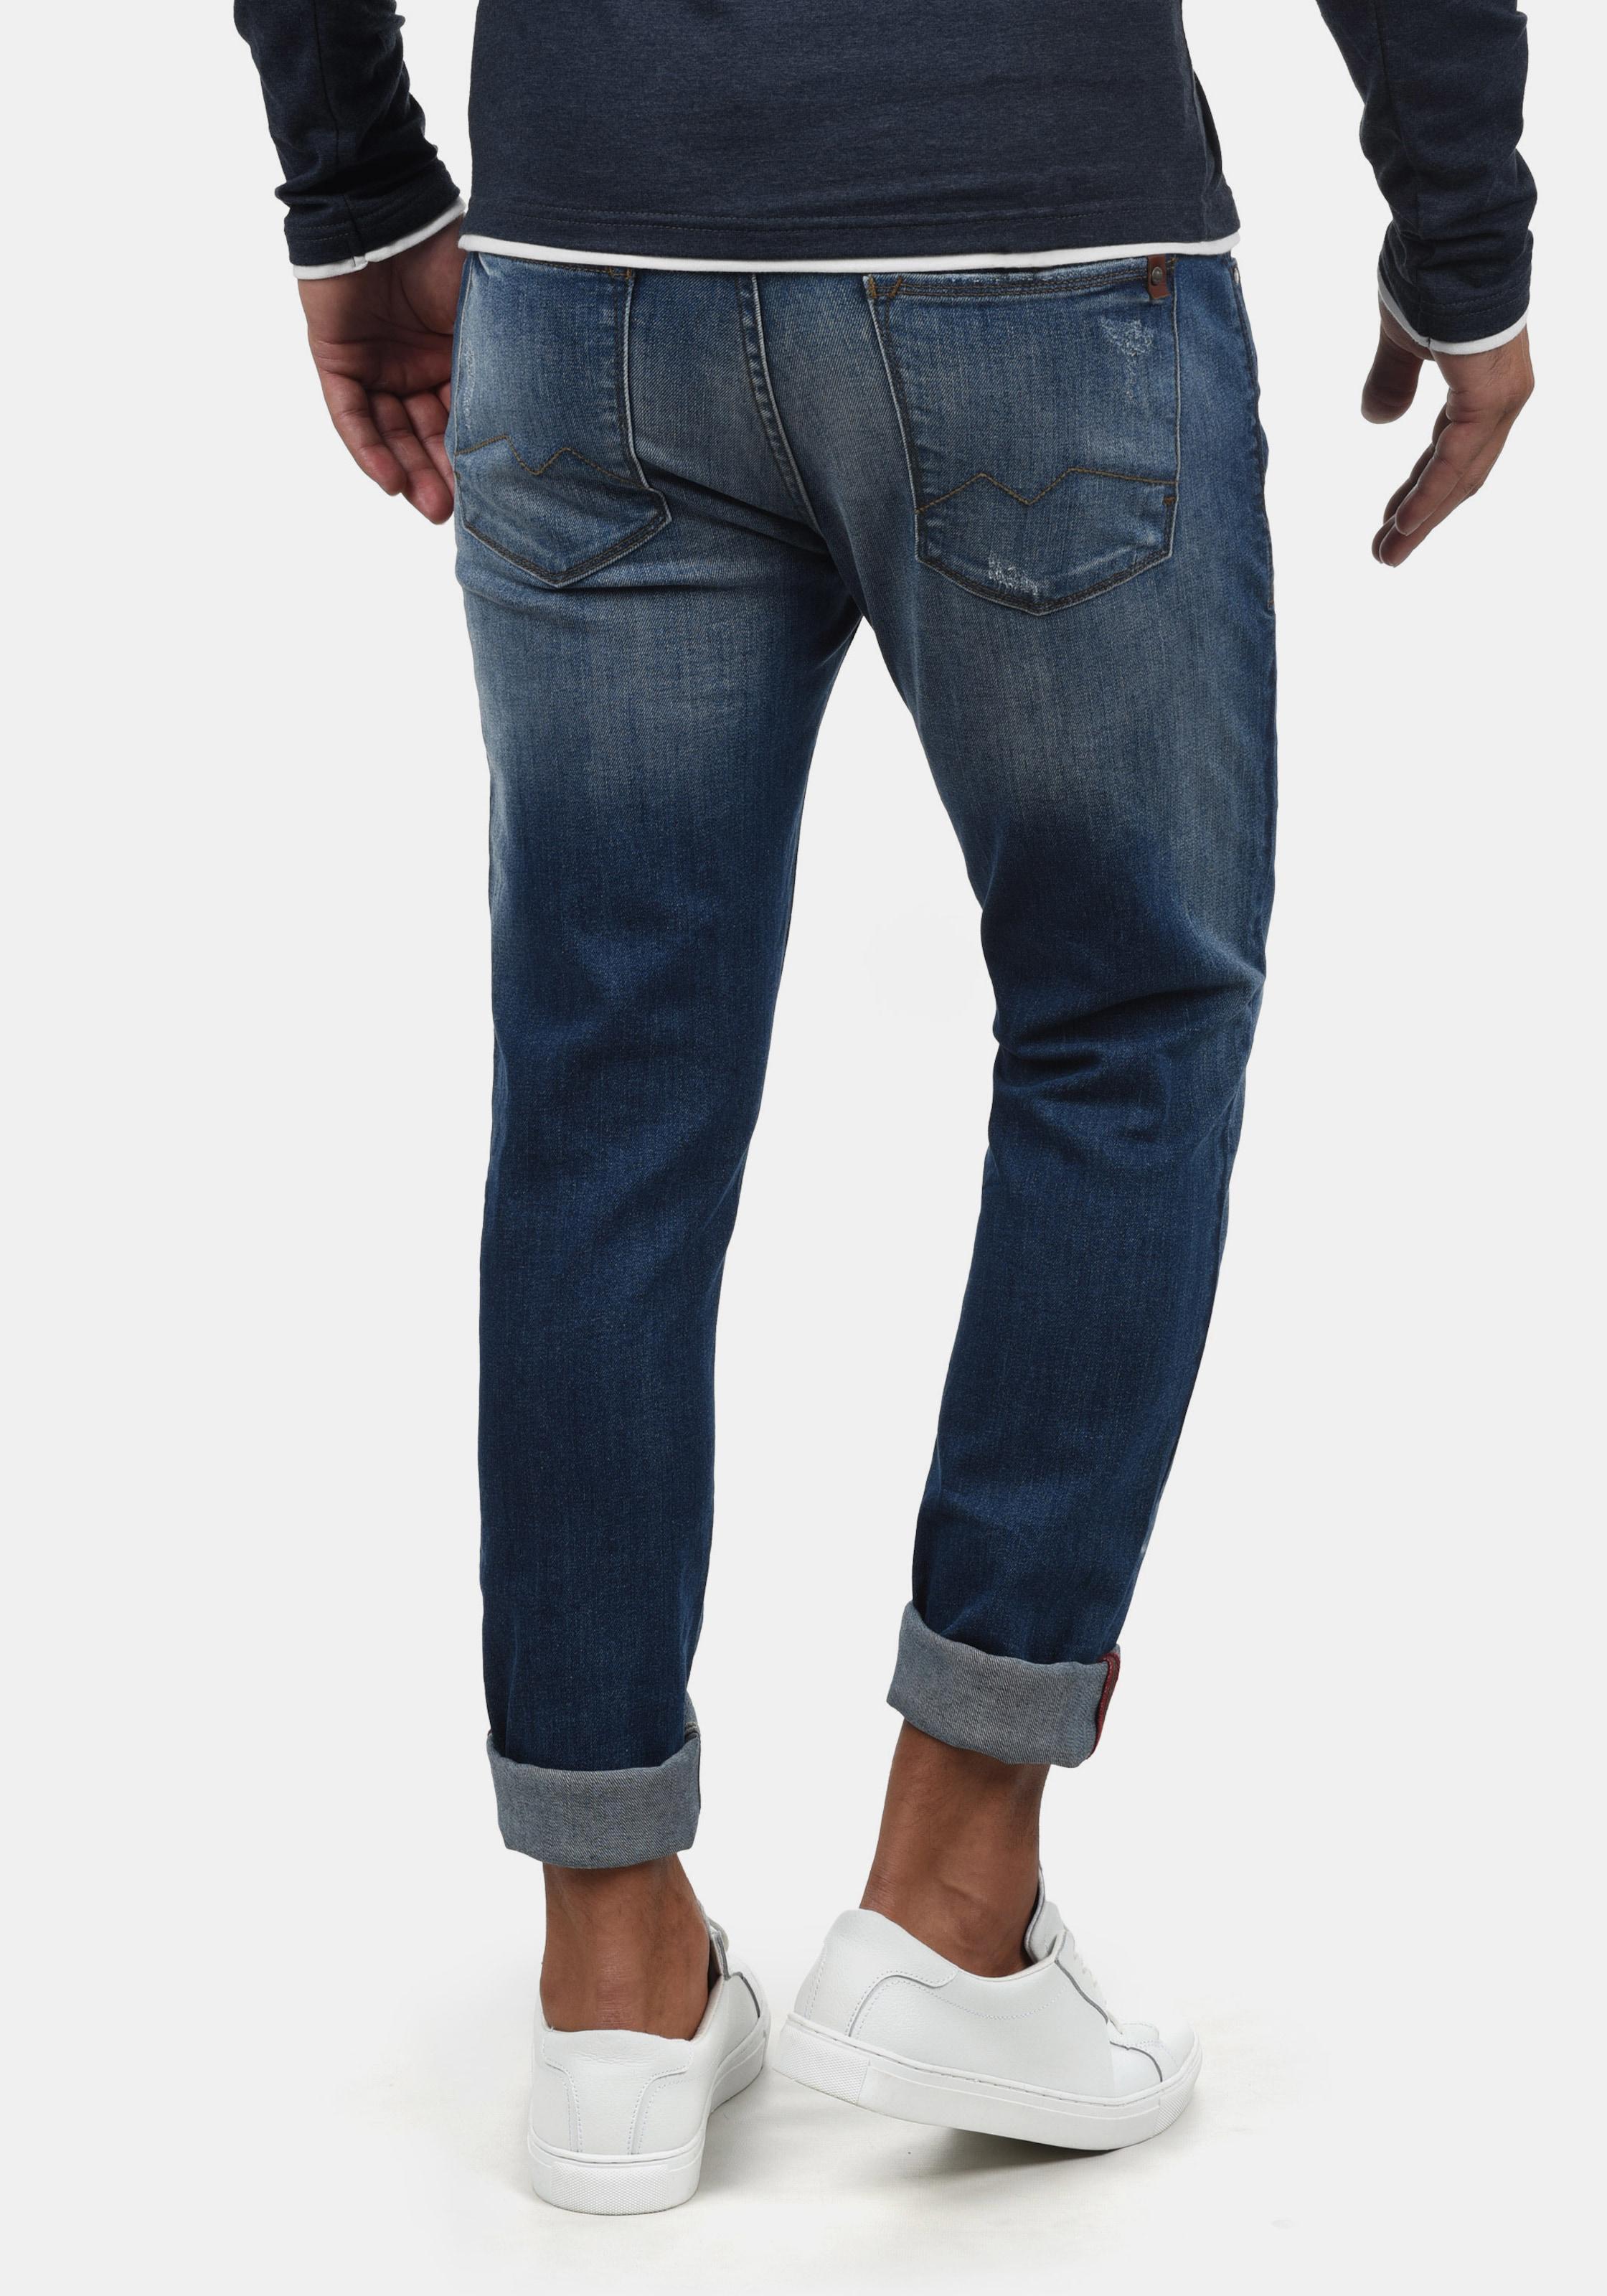 pocket 'husao' Blend In jeans Blau 5 LqSMUzpGV